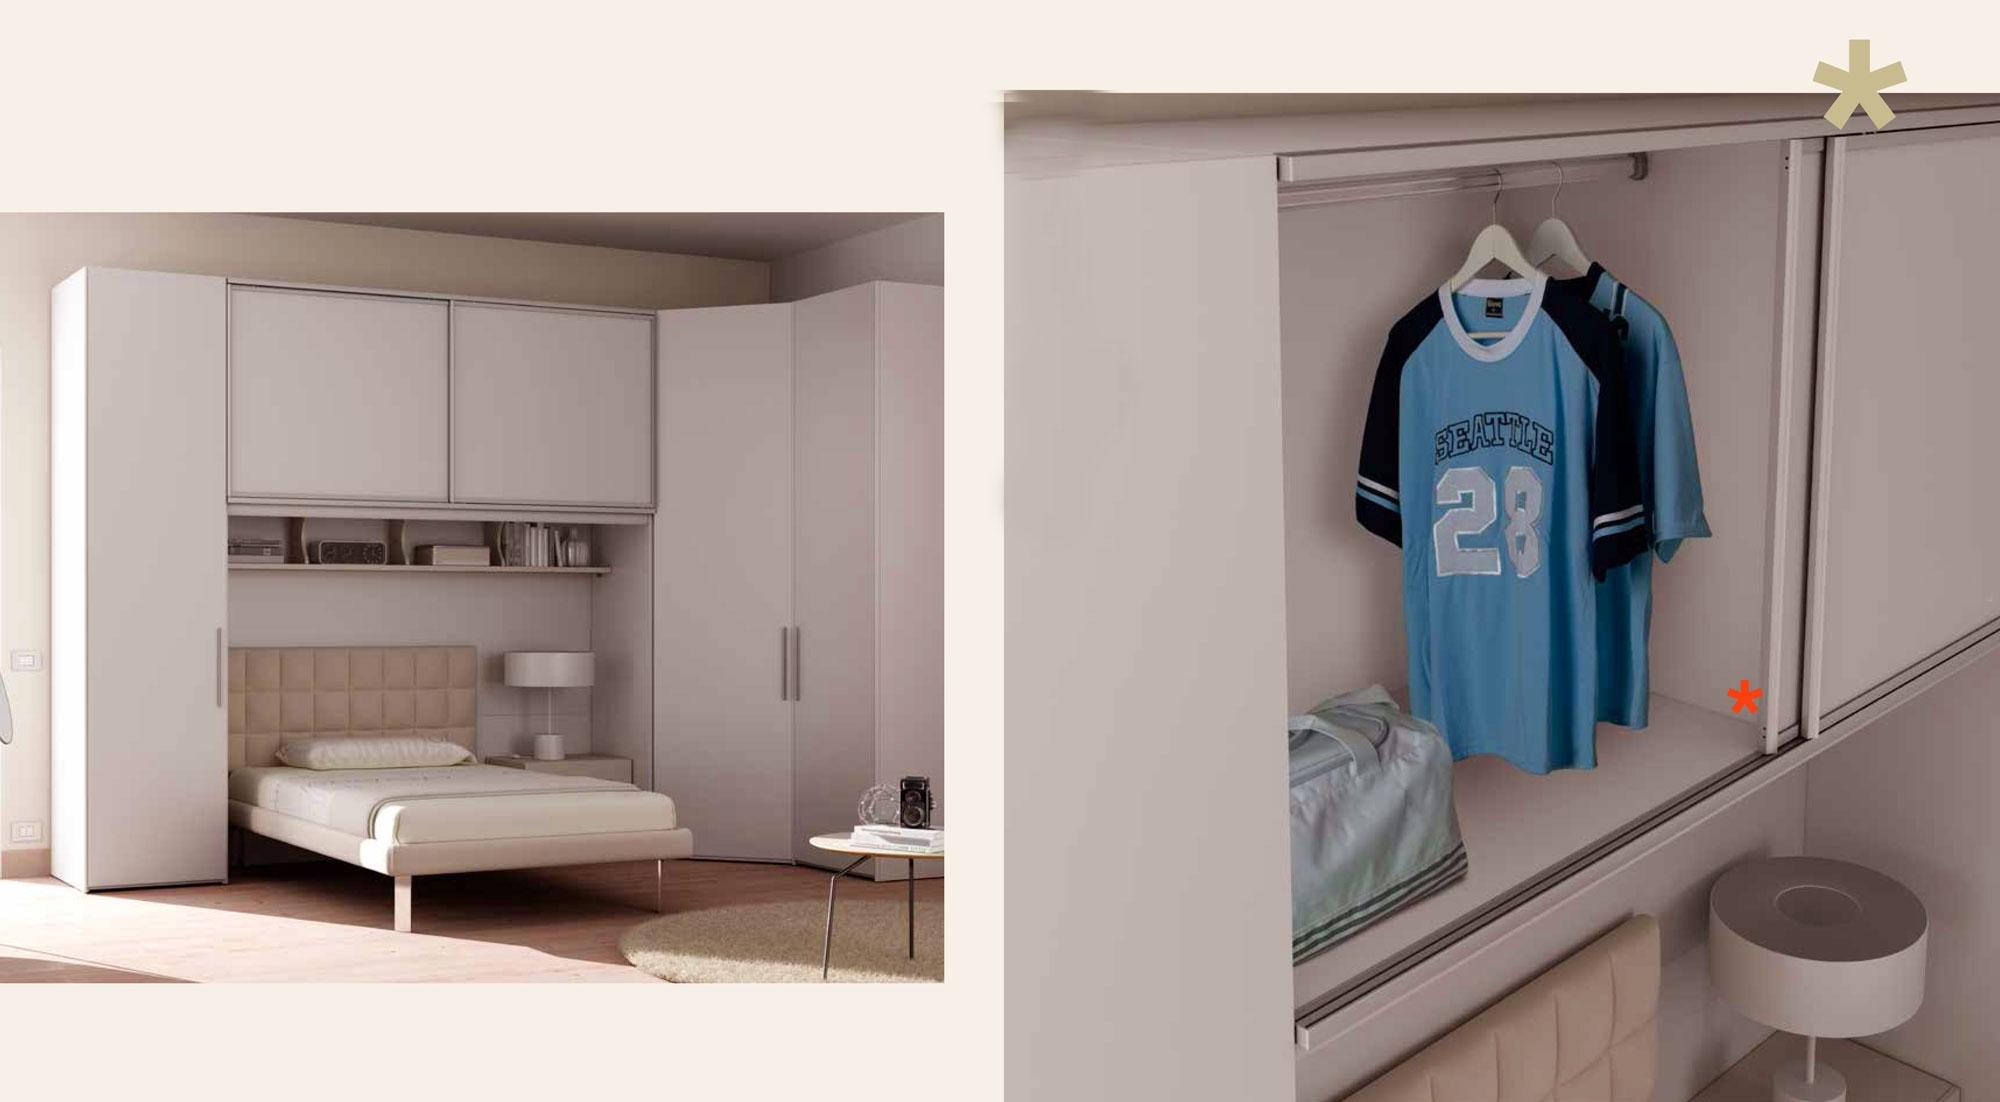 Chambre ado complète lit 1 personne design - MORETTI COMPACT - SO NUIT